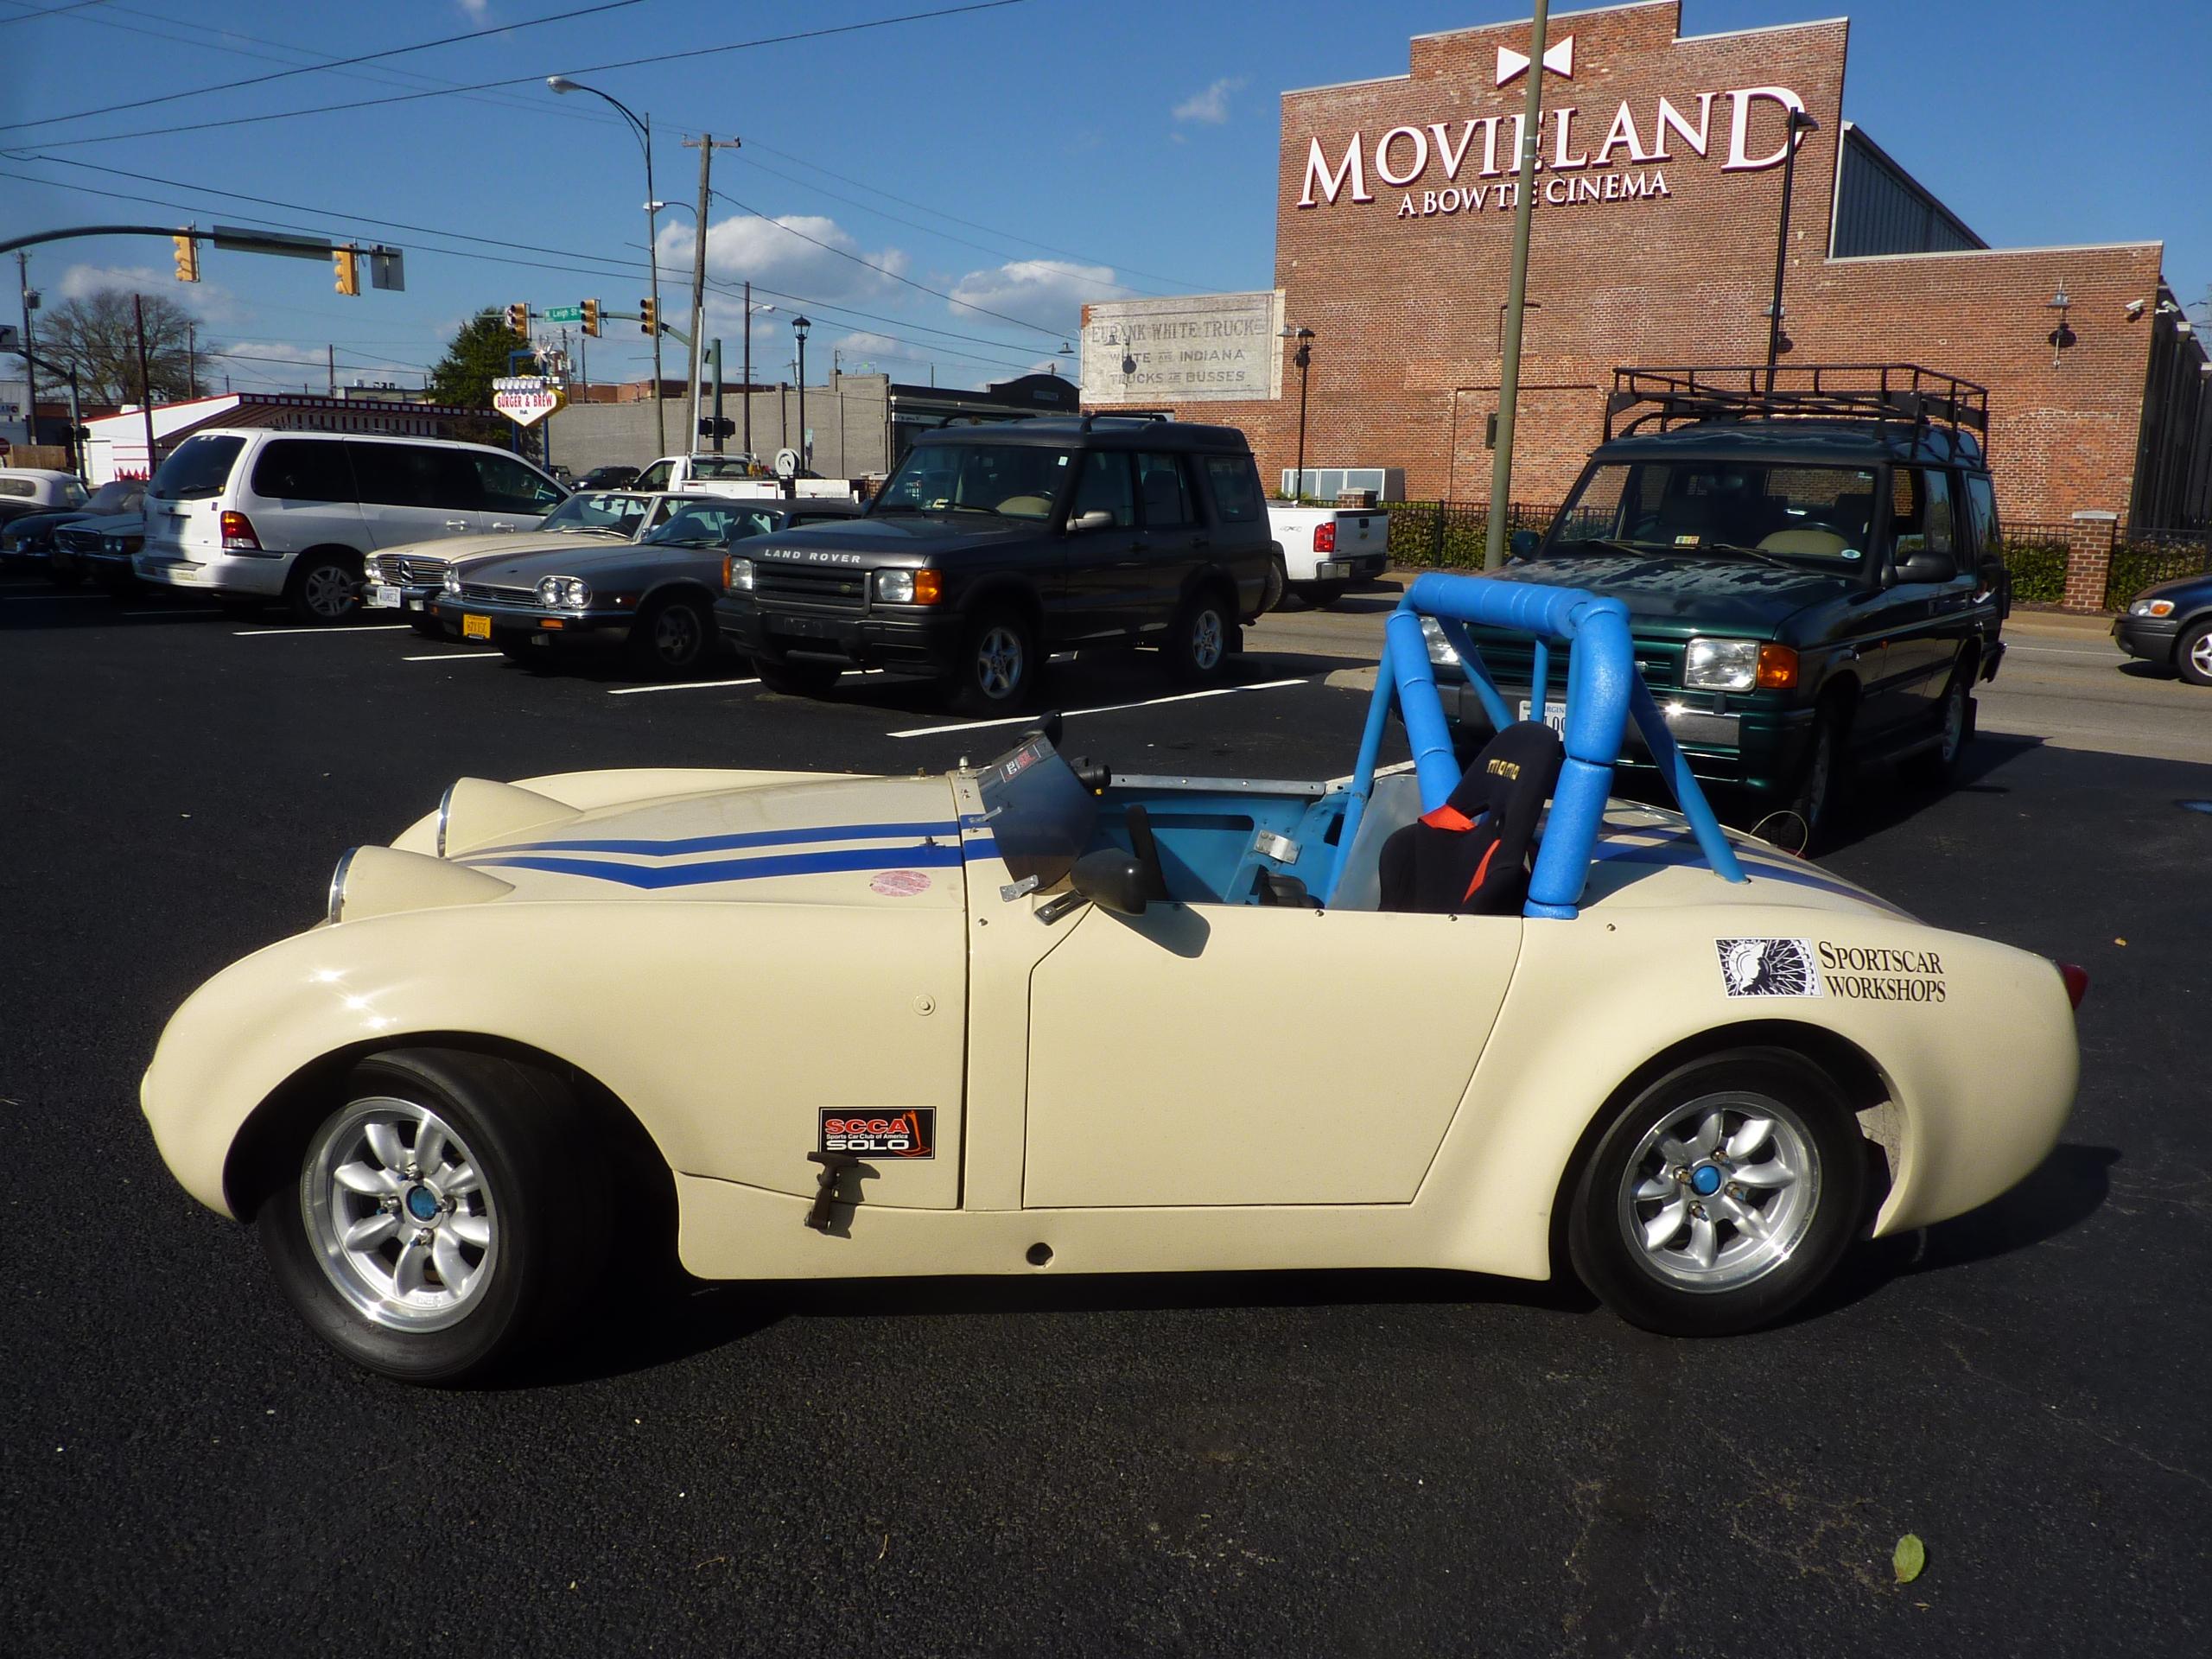 Bugeye Sprite Racer • Sportscar Workshops